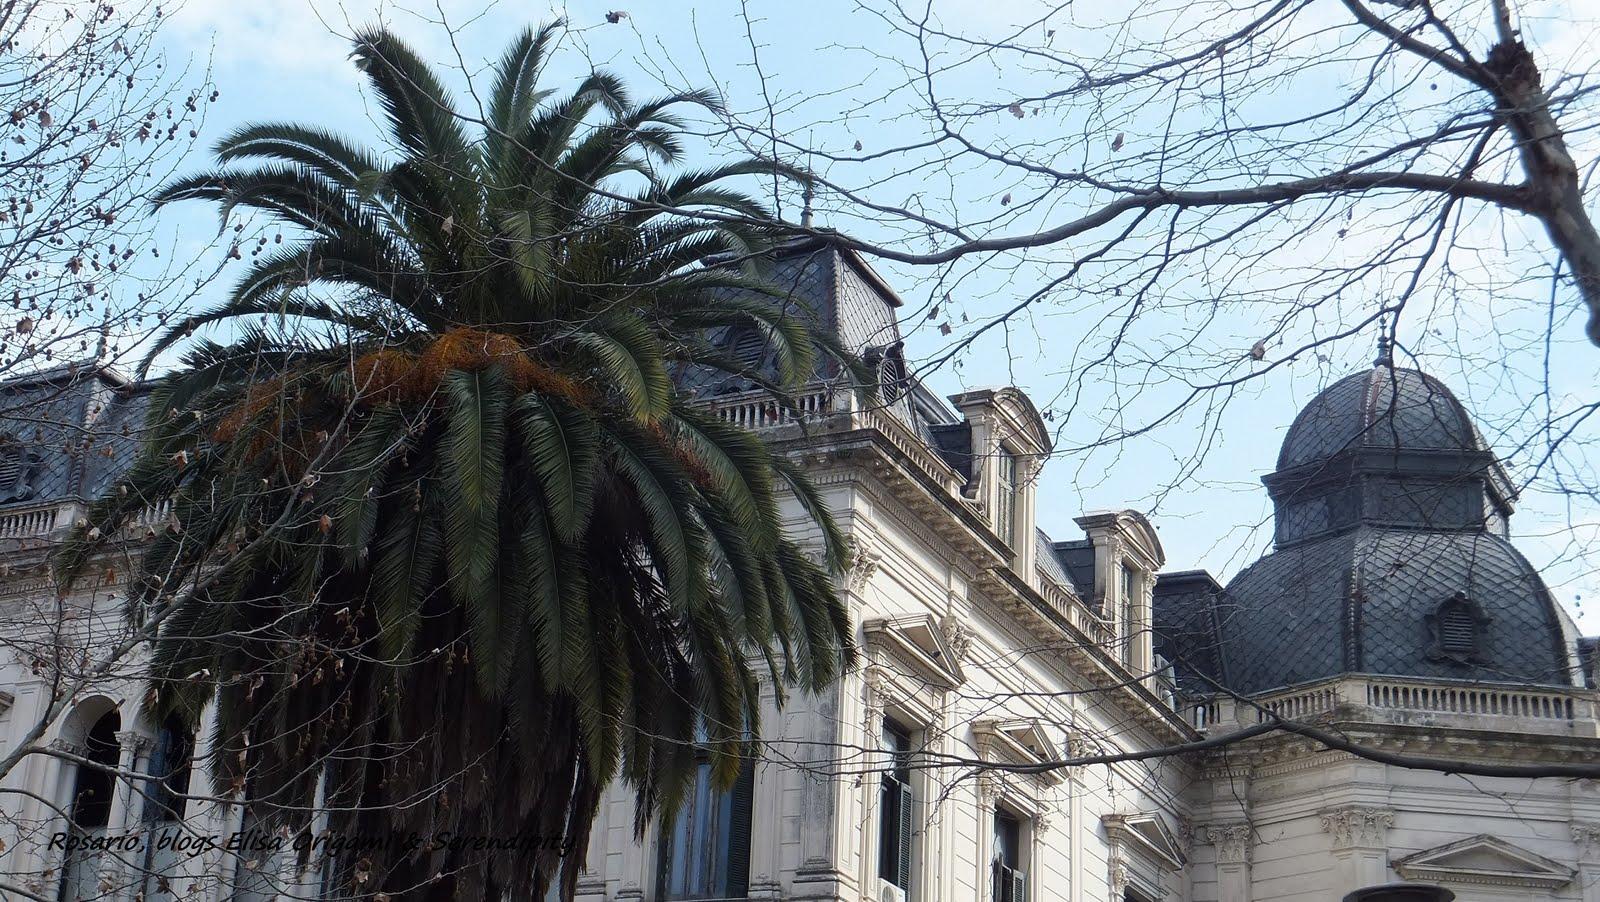 Boulevard Oroño, Rosario, Argentina, Elisa N, Blog de Viajes, Lifestyle, Travel